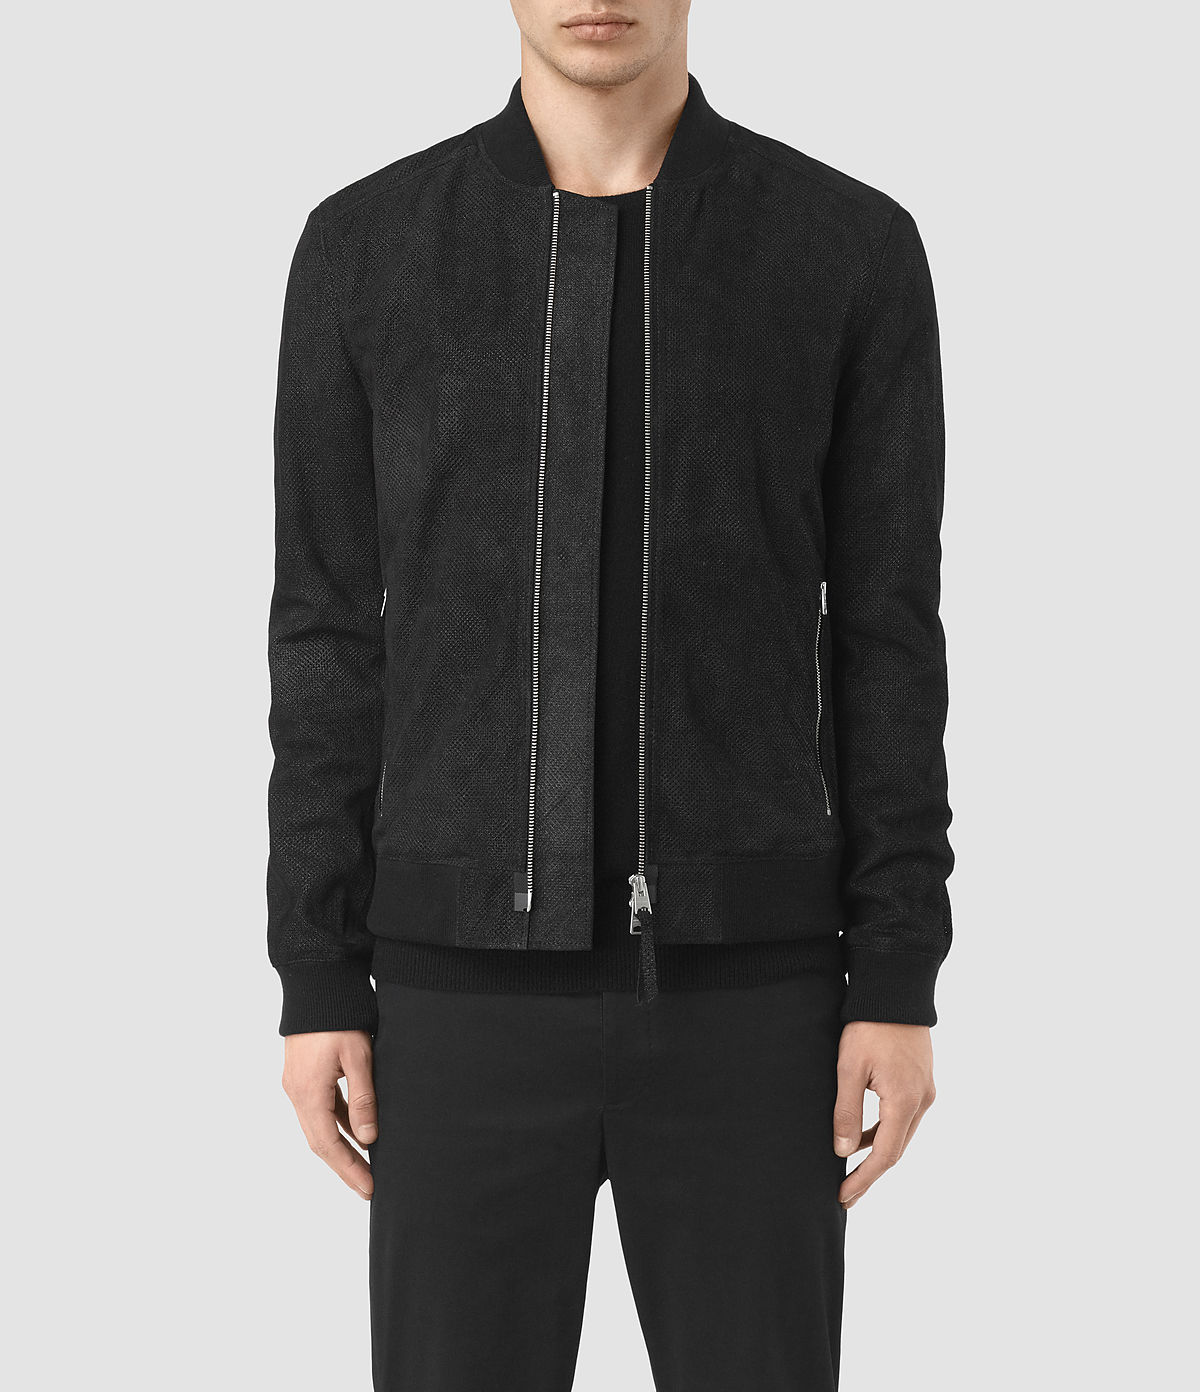 tyde-leather-bomber-jacket